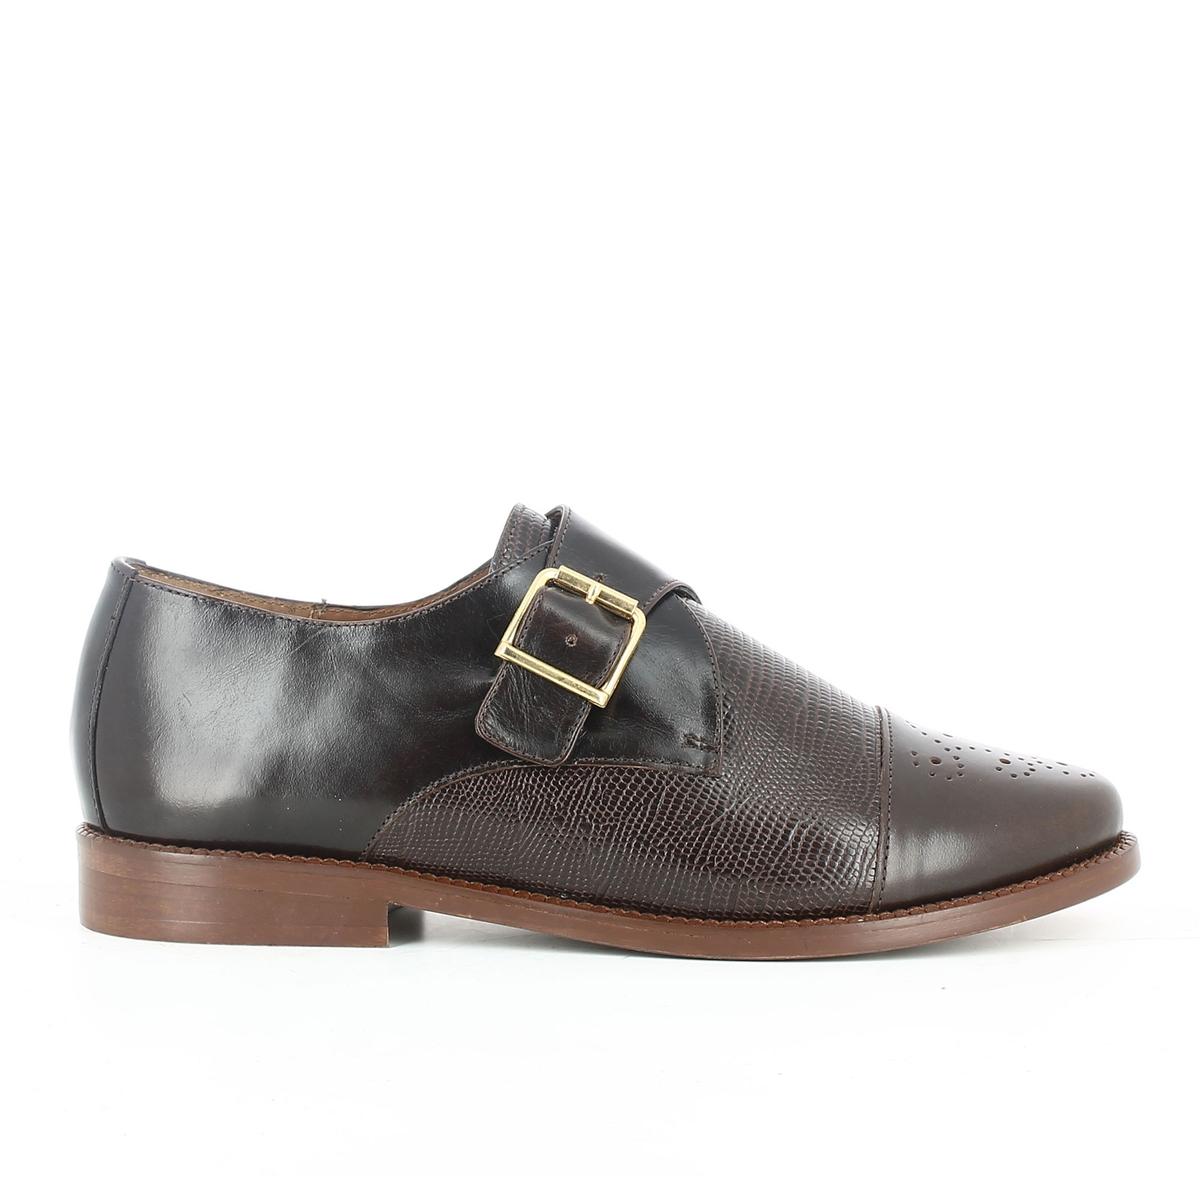 Ботинки-дерби Dirca